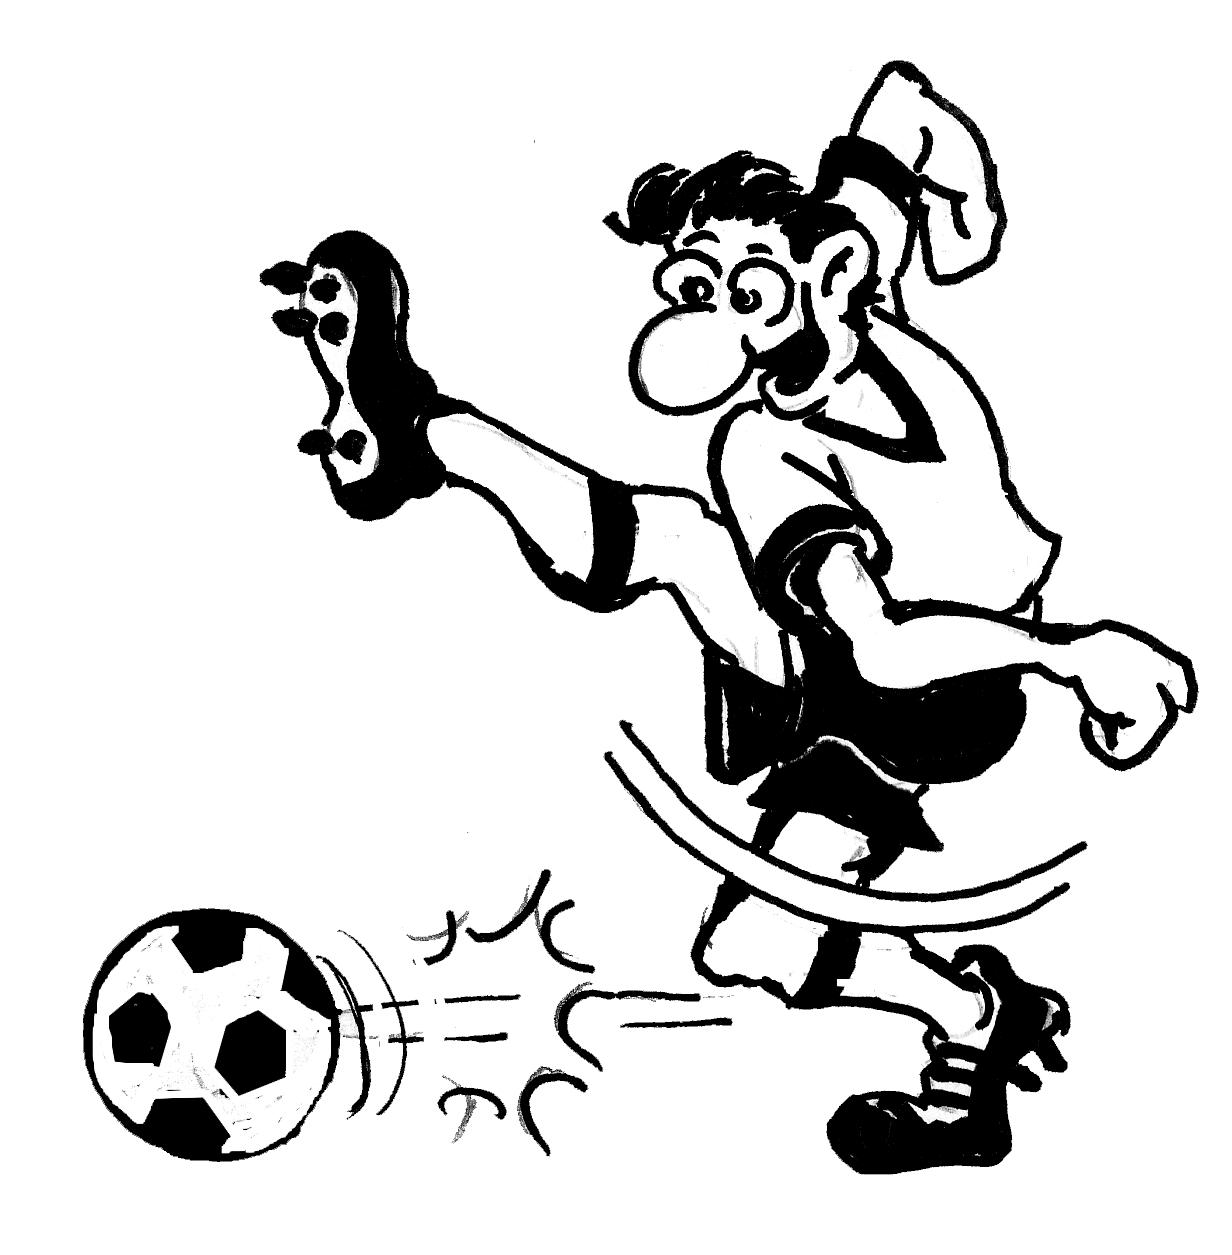 de fussball